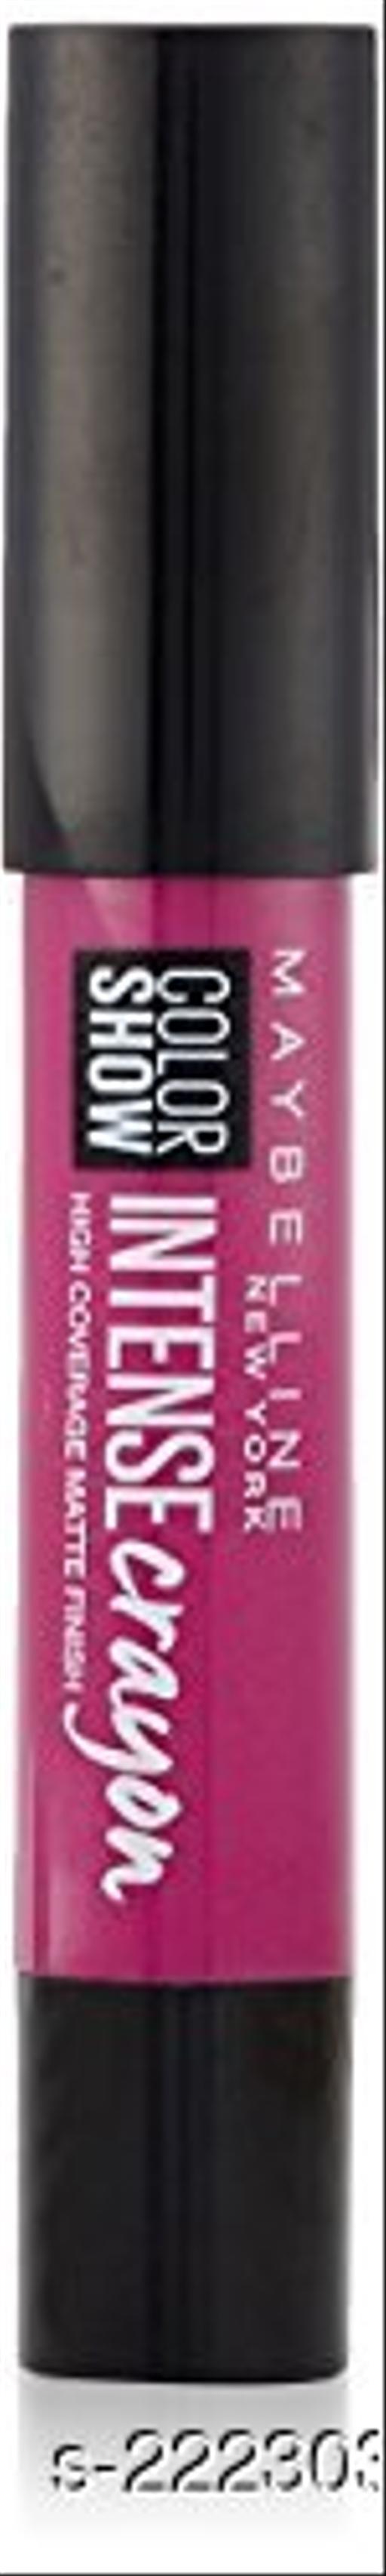 Maybelline New York Color Show Intense Lip Crayon, Mystic Mauve, 3.5g